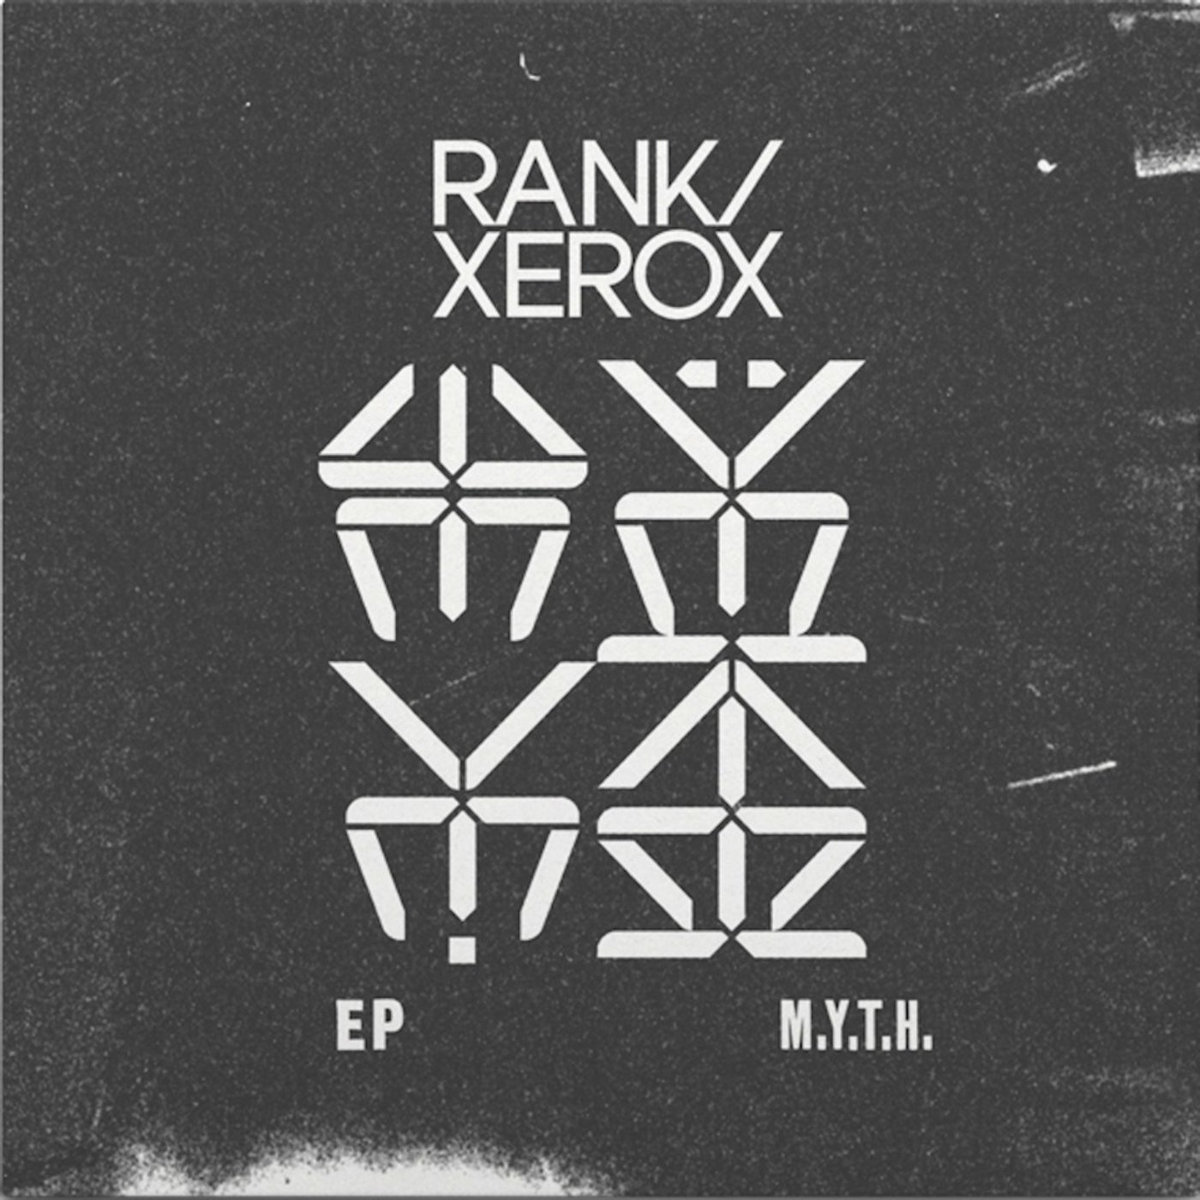 RANK / XEROX m.y.t.h. – Vinyl LP (black)